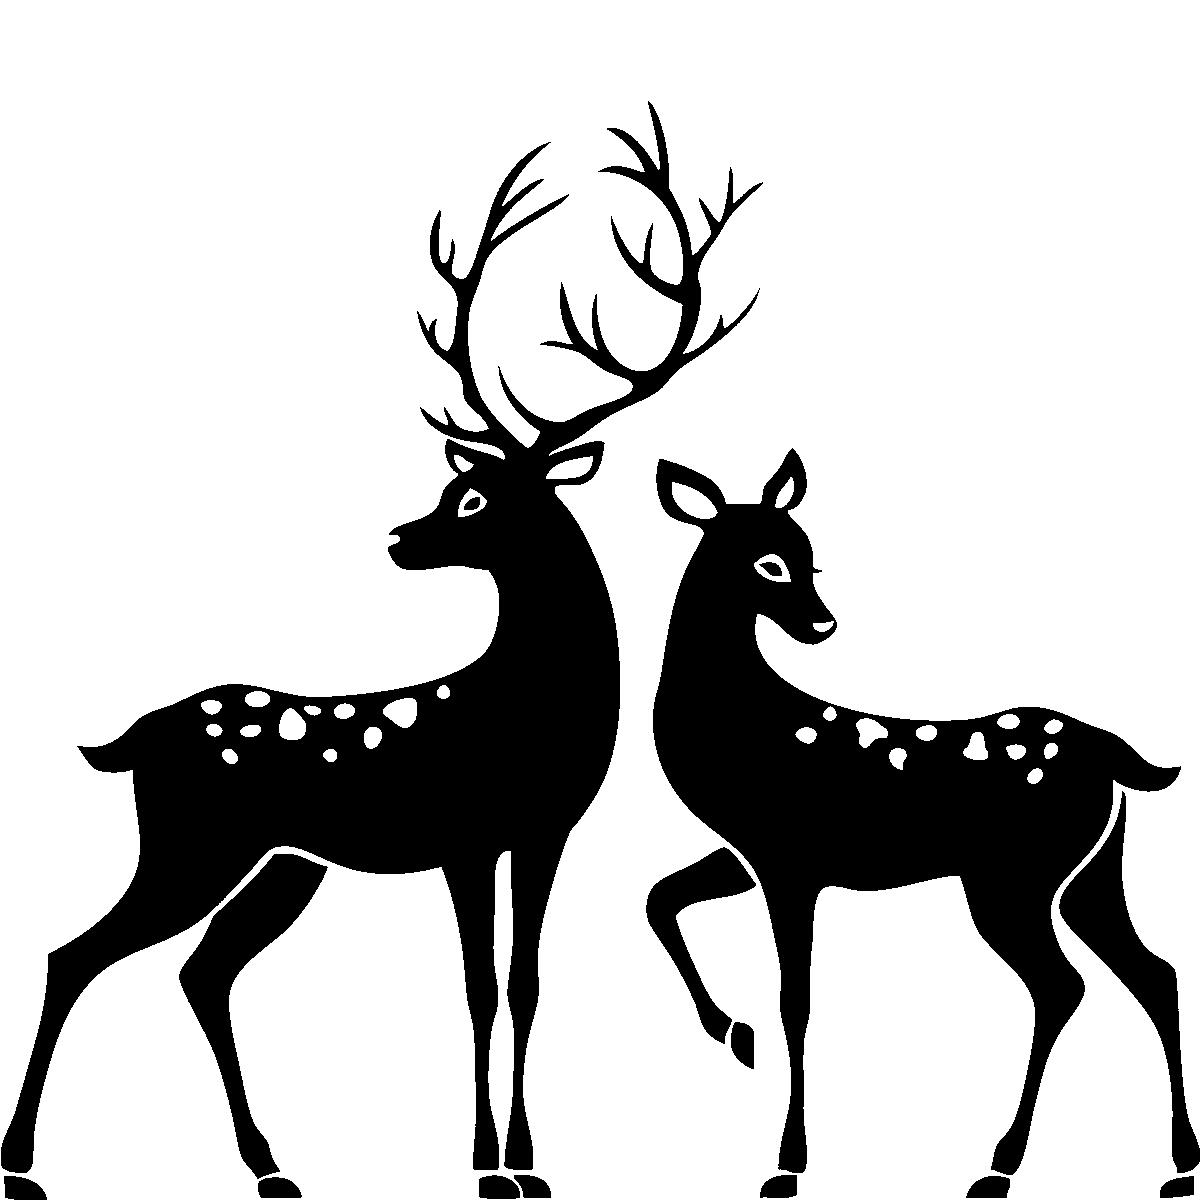 Deer clipart spotted deer. Drawn buck female pencil